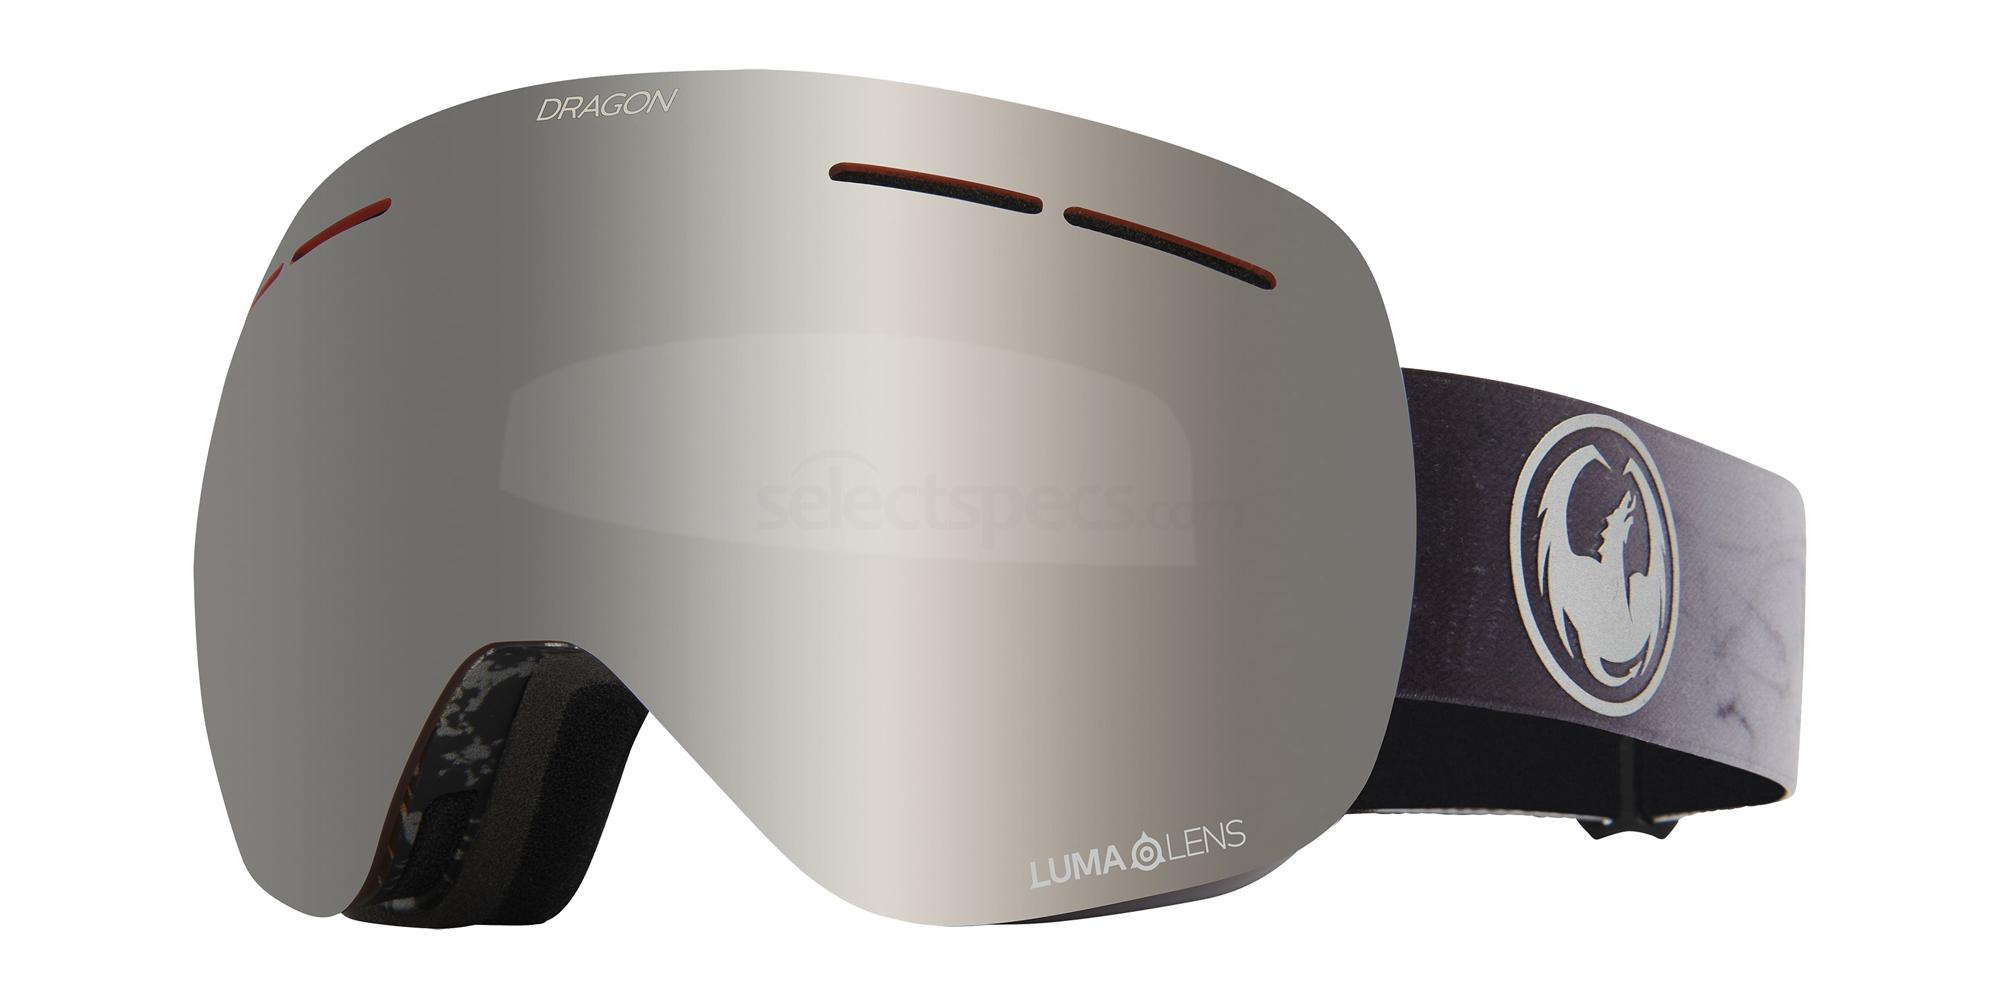 048 DR X1S BONUS Goggles, Dragon